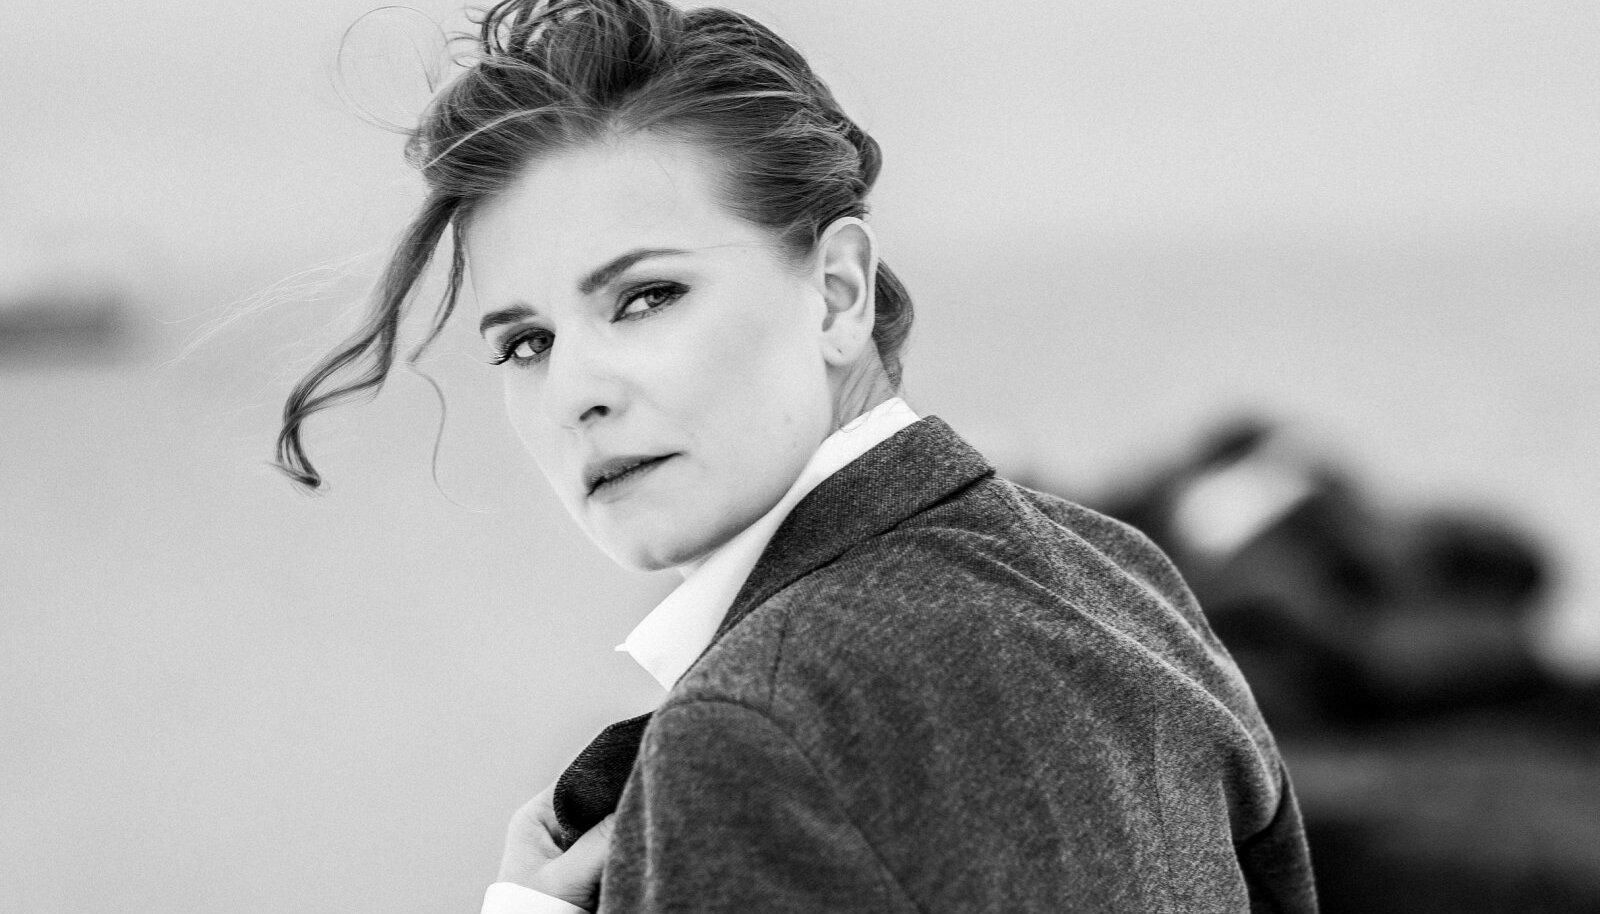 Susanna Aleksandra Veldi